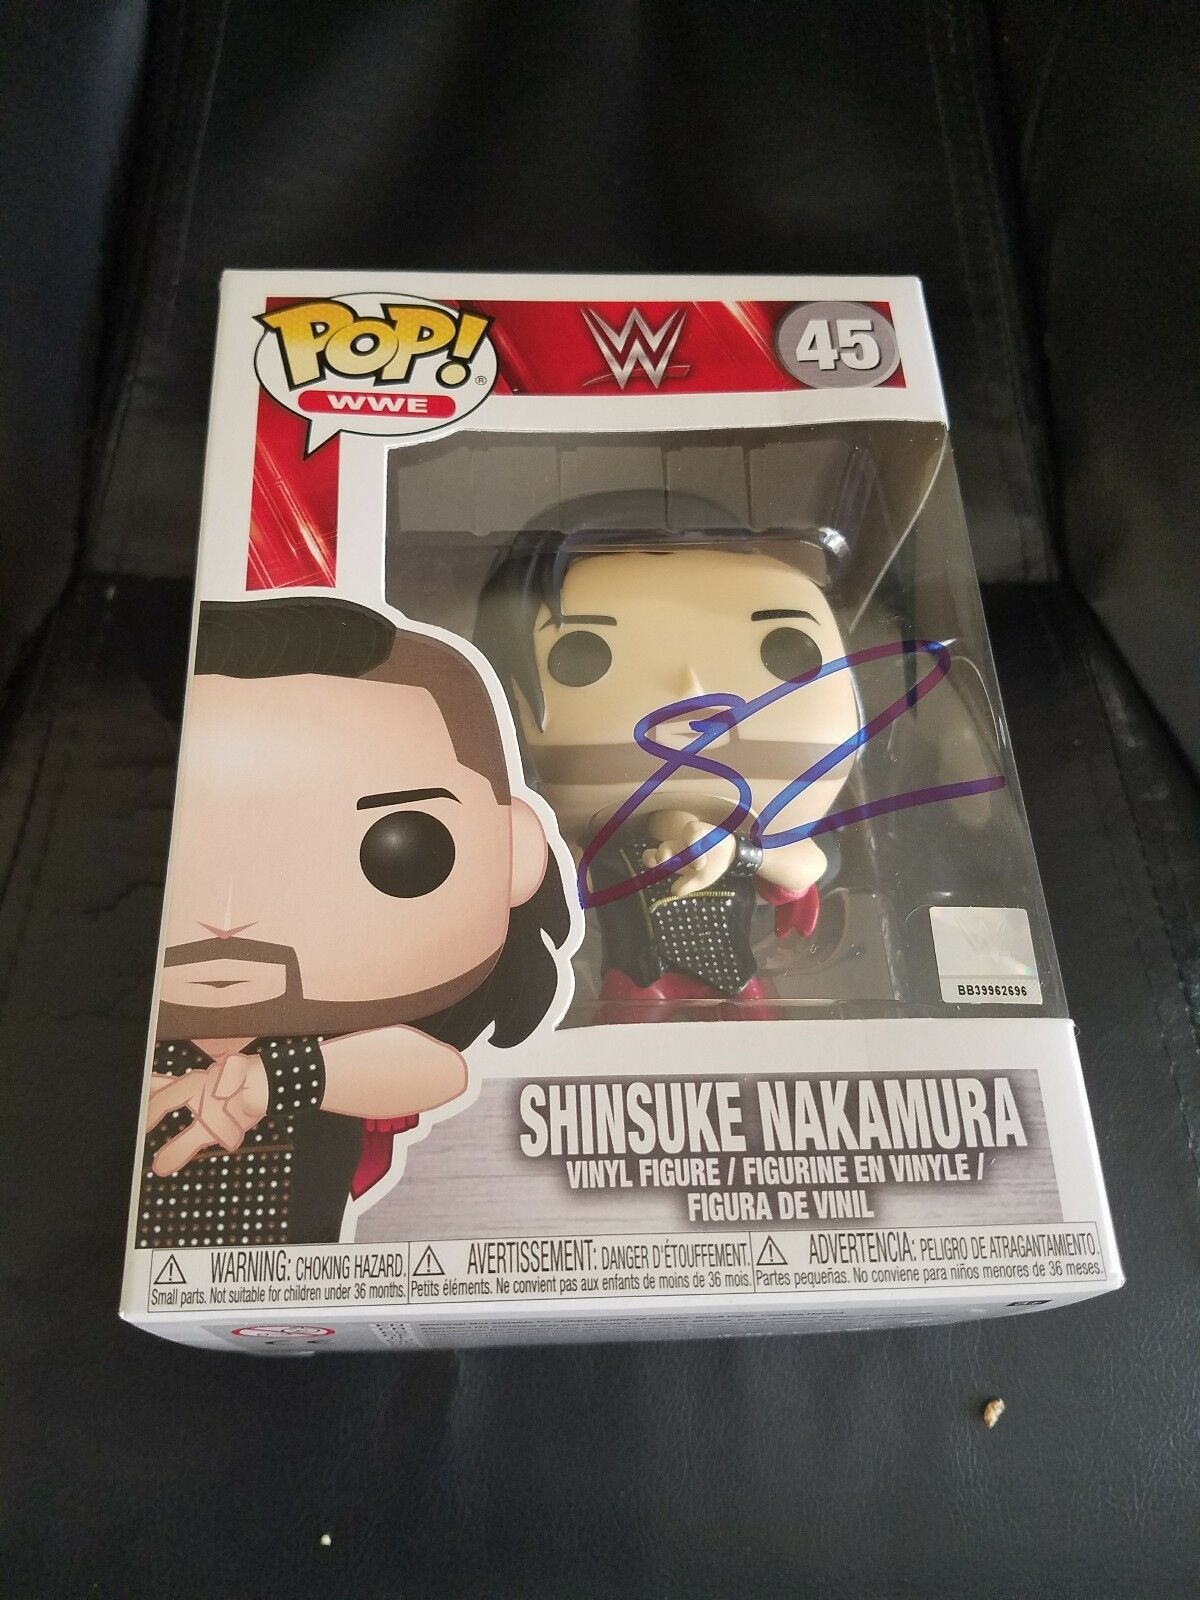 Wwe Shinsuke Nakamura autógrafo  Funko Pop